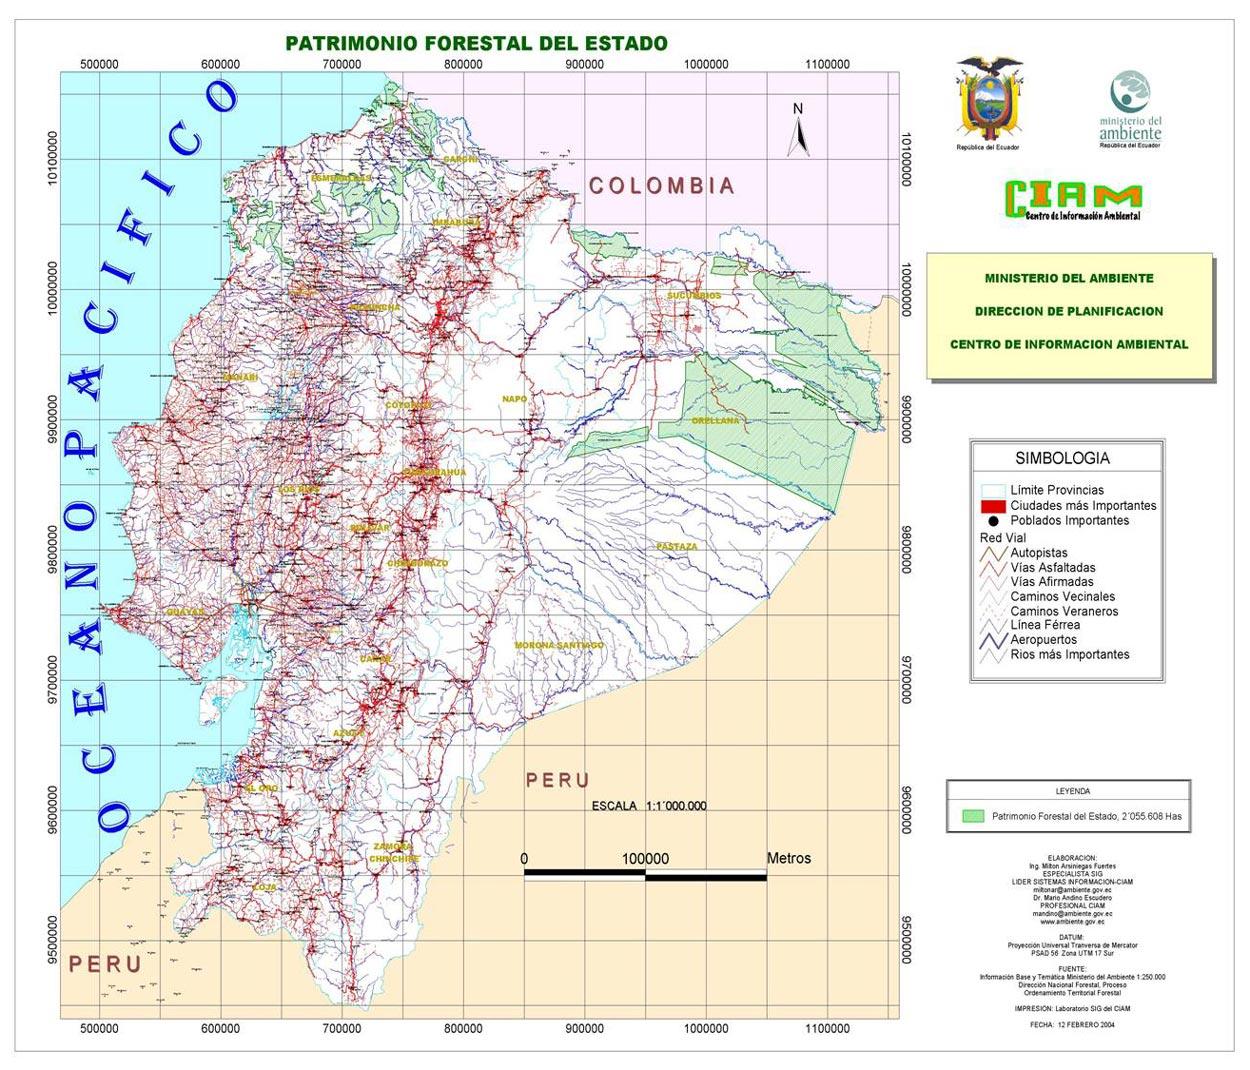 Ecuadorian State forest patrimony 2004